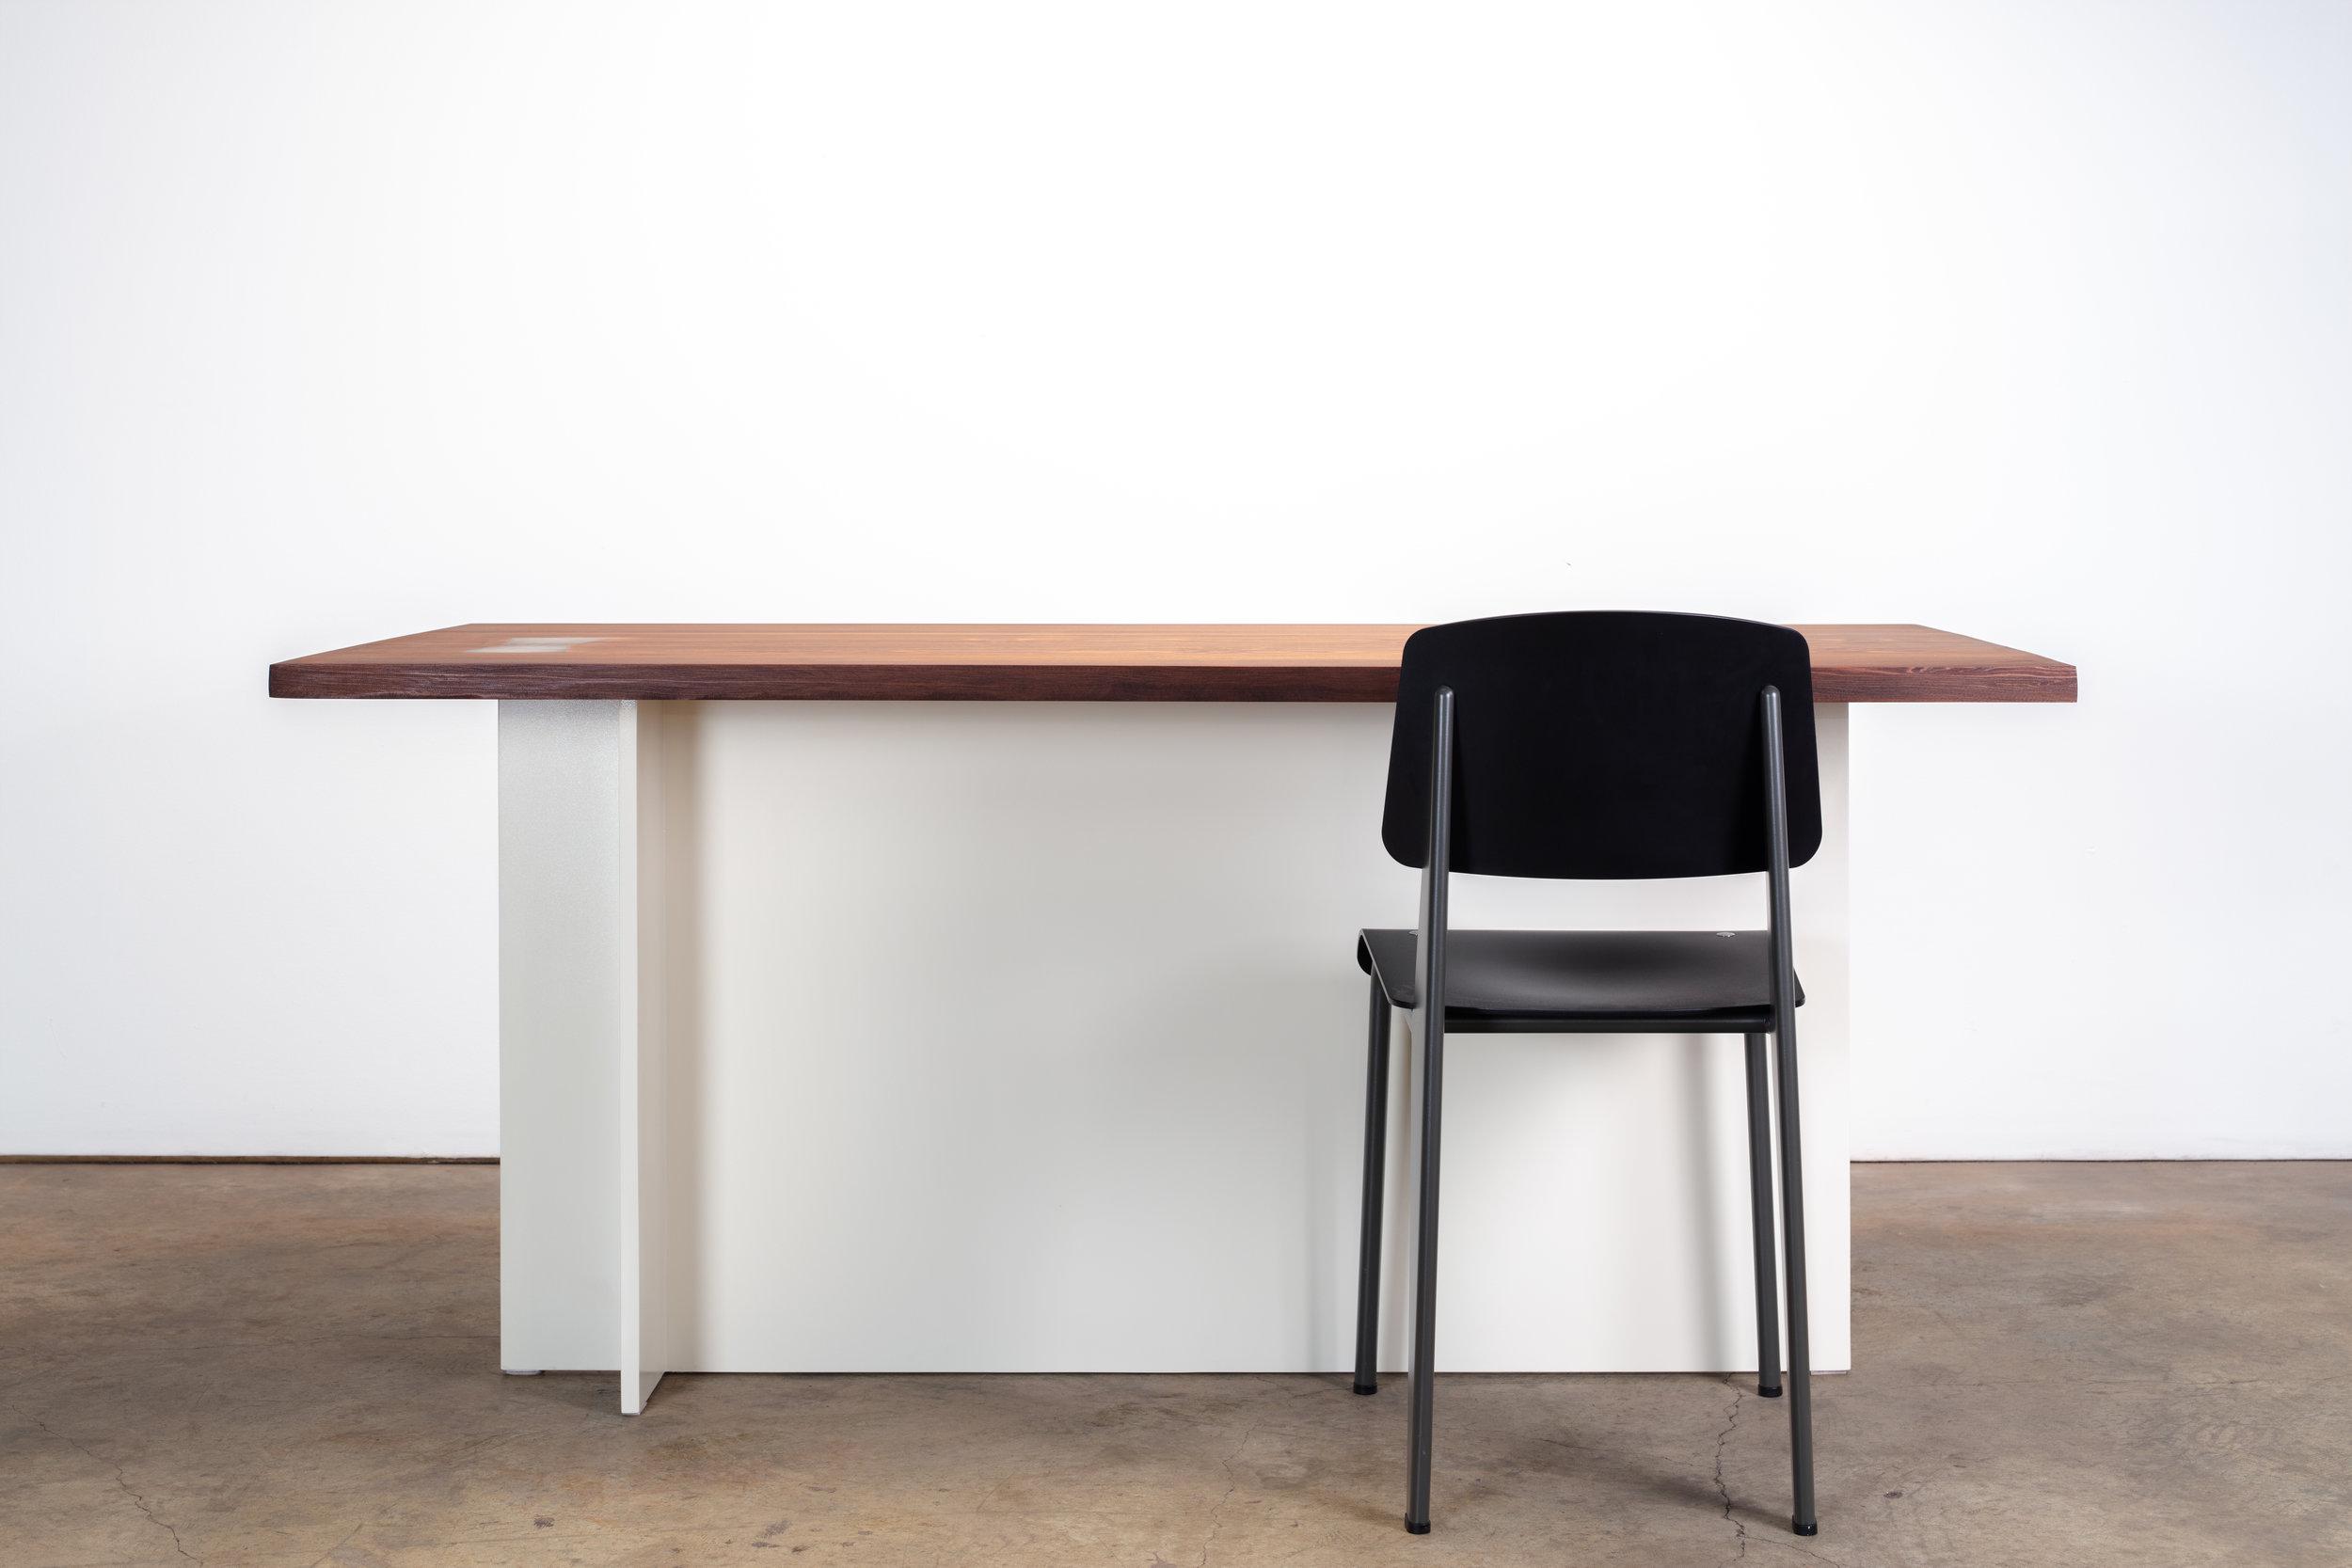 ki_raleighslabs-desk2.jpg